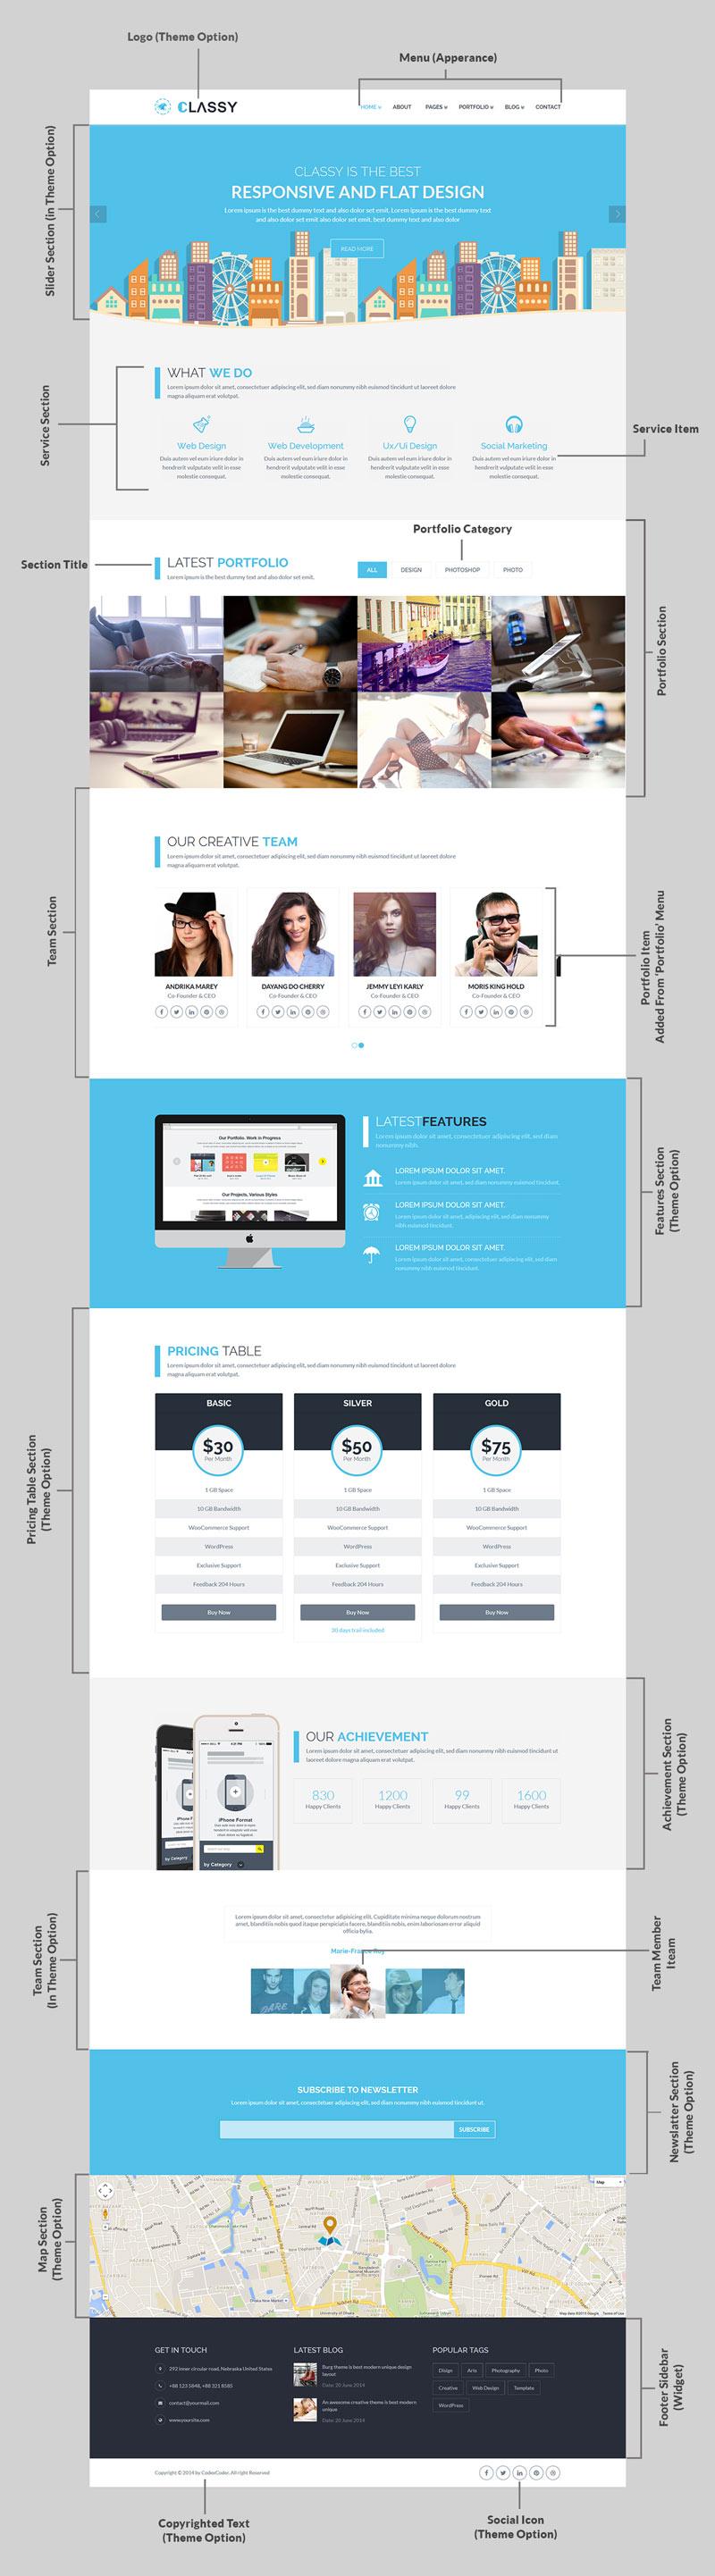 classy-layout